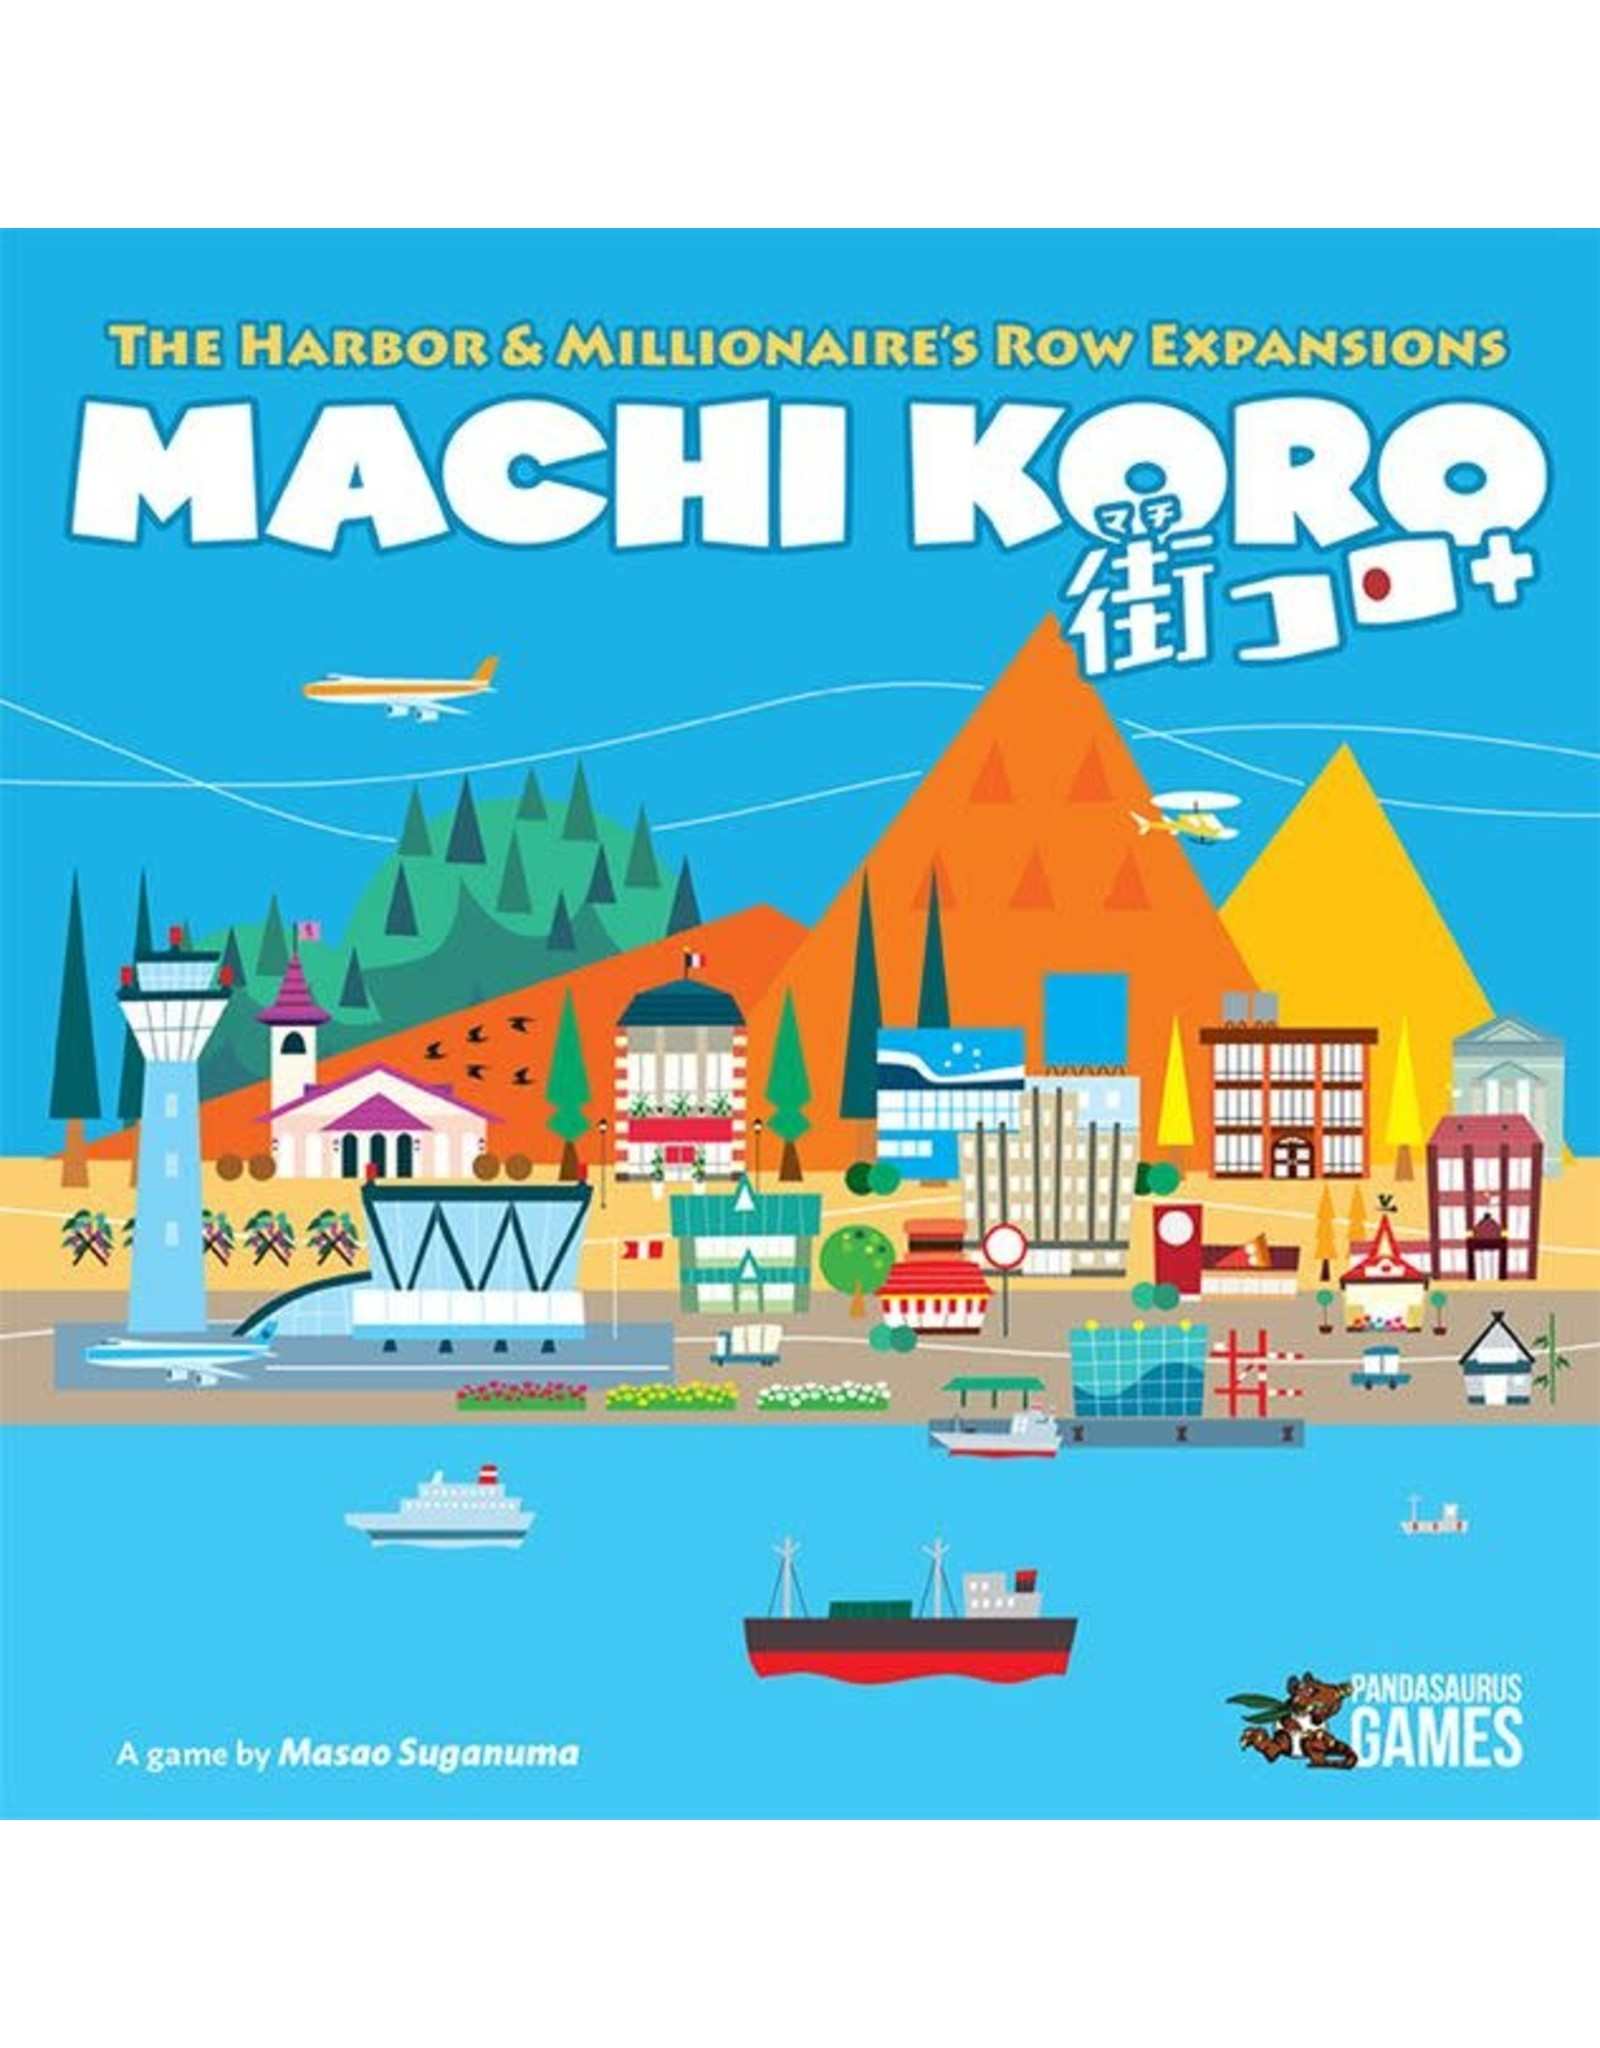 Machi Koro The Harbor & Millionaire's Row Expansion